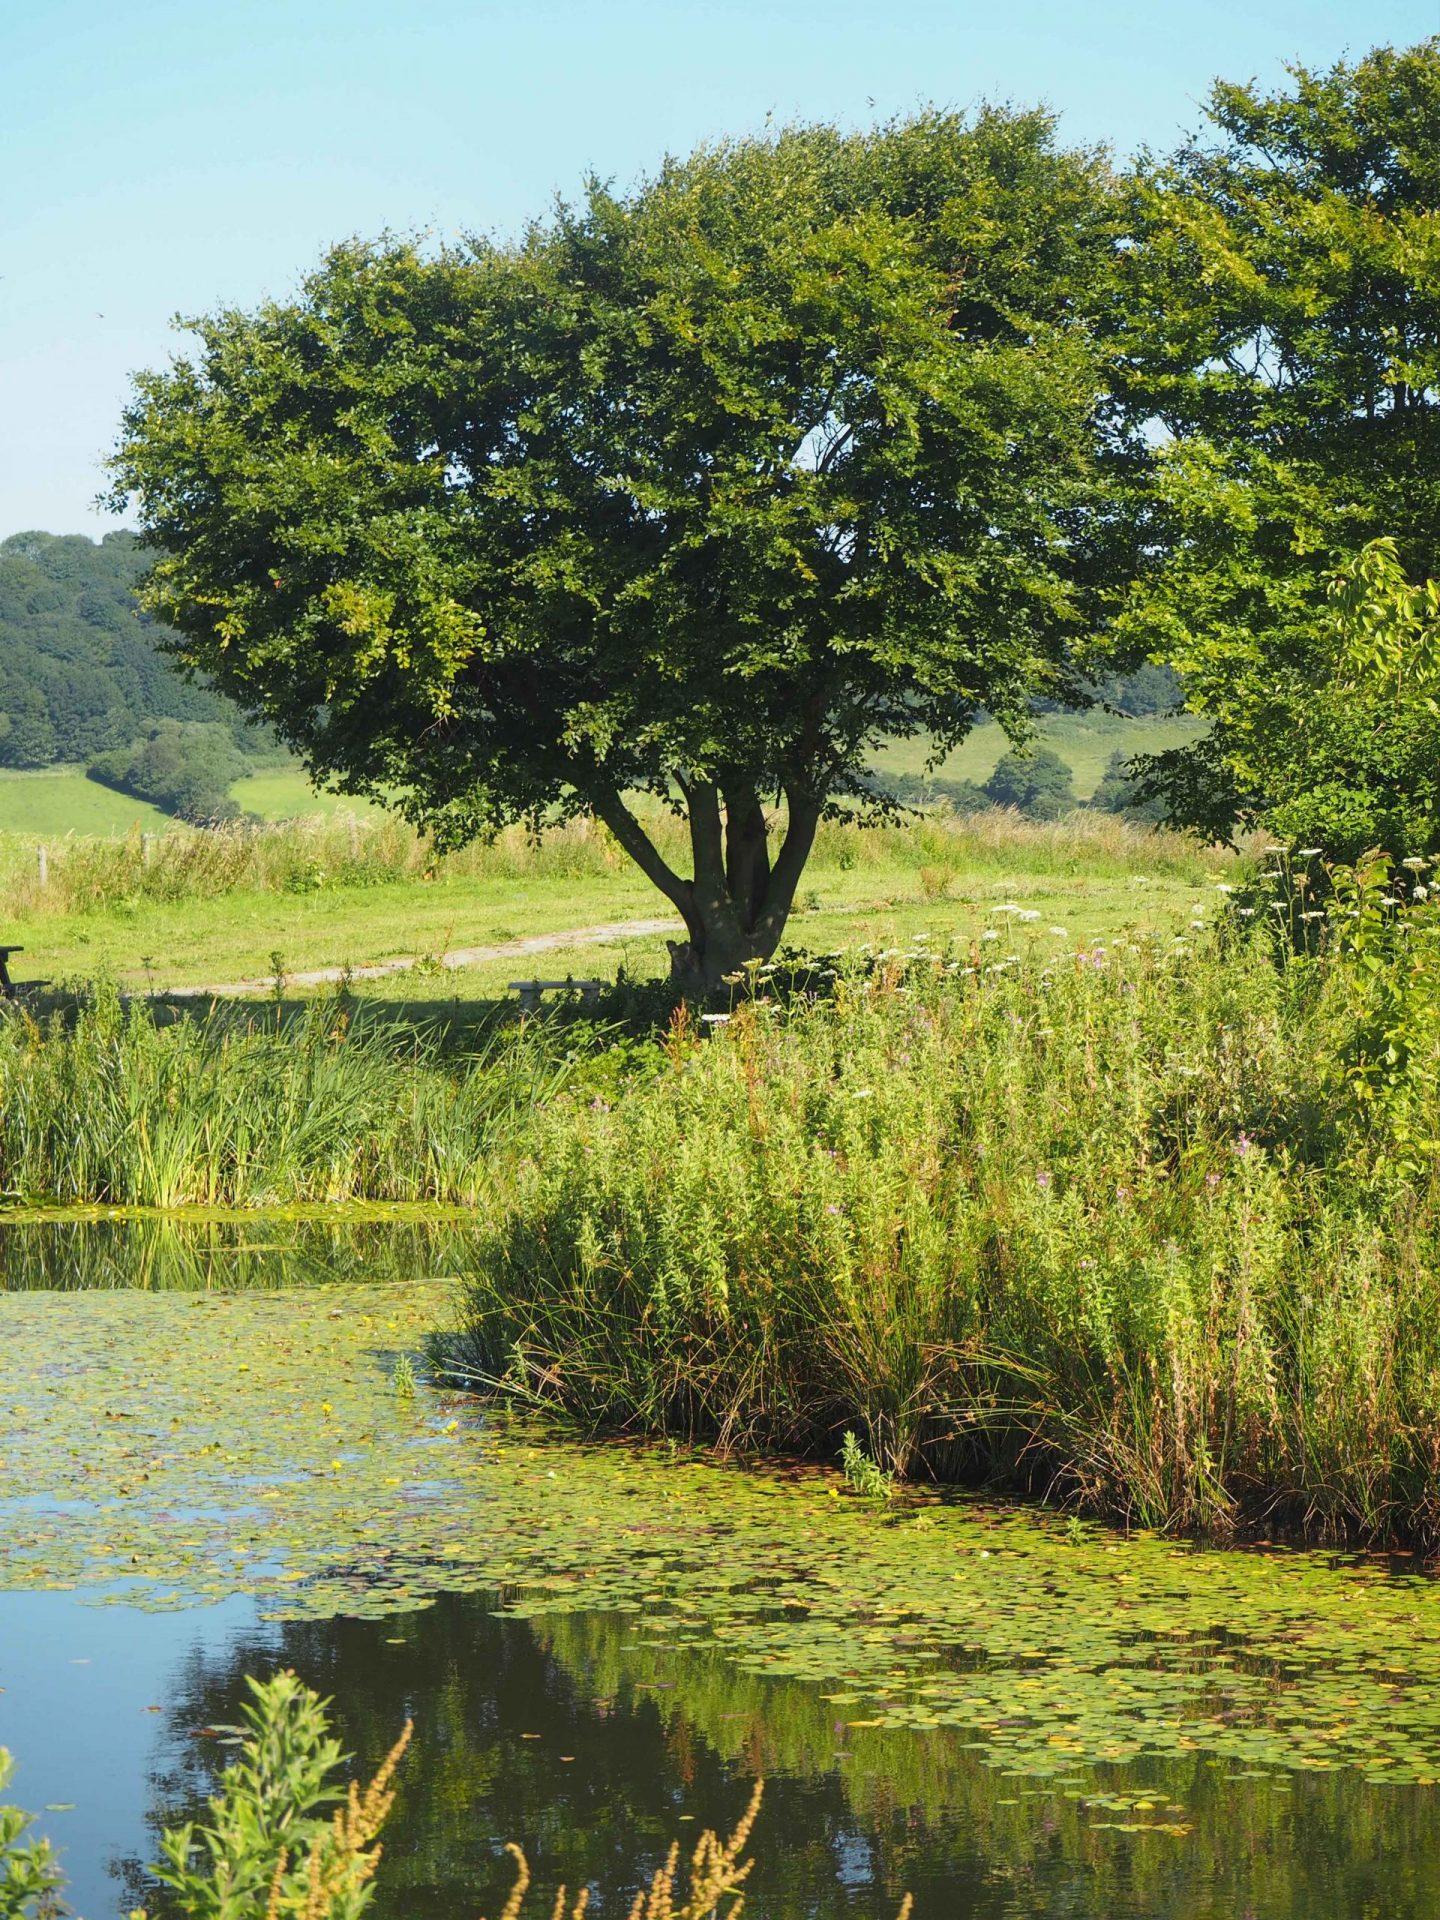 Ox Pasture Hall, Scarborough, North Yorkshire - Rachel Nicole UK Travel Blogger 2